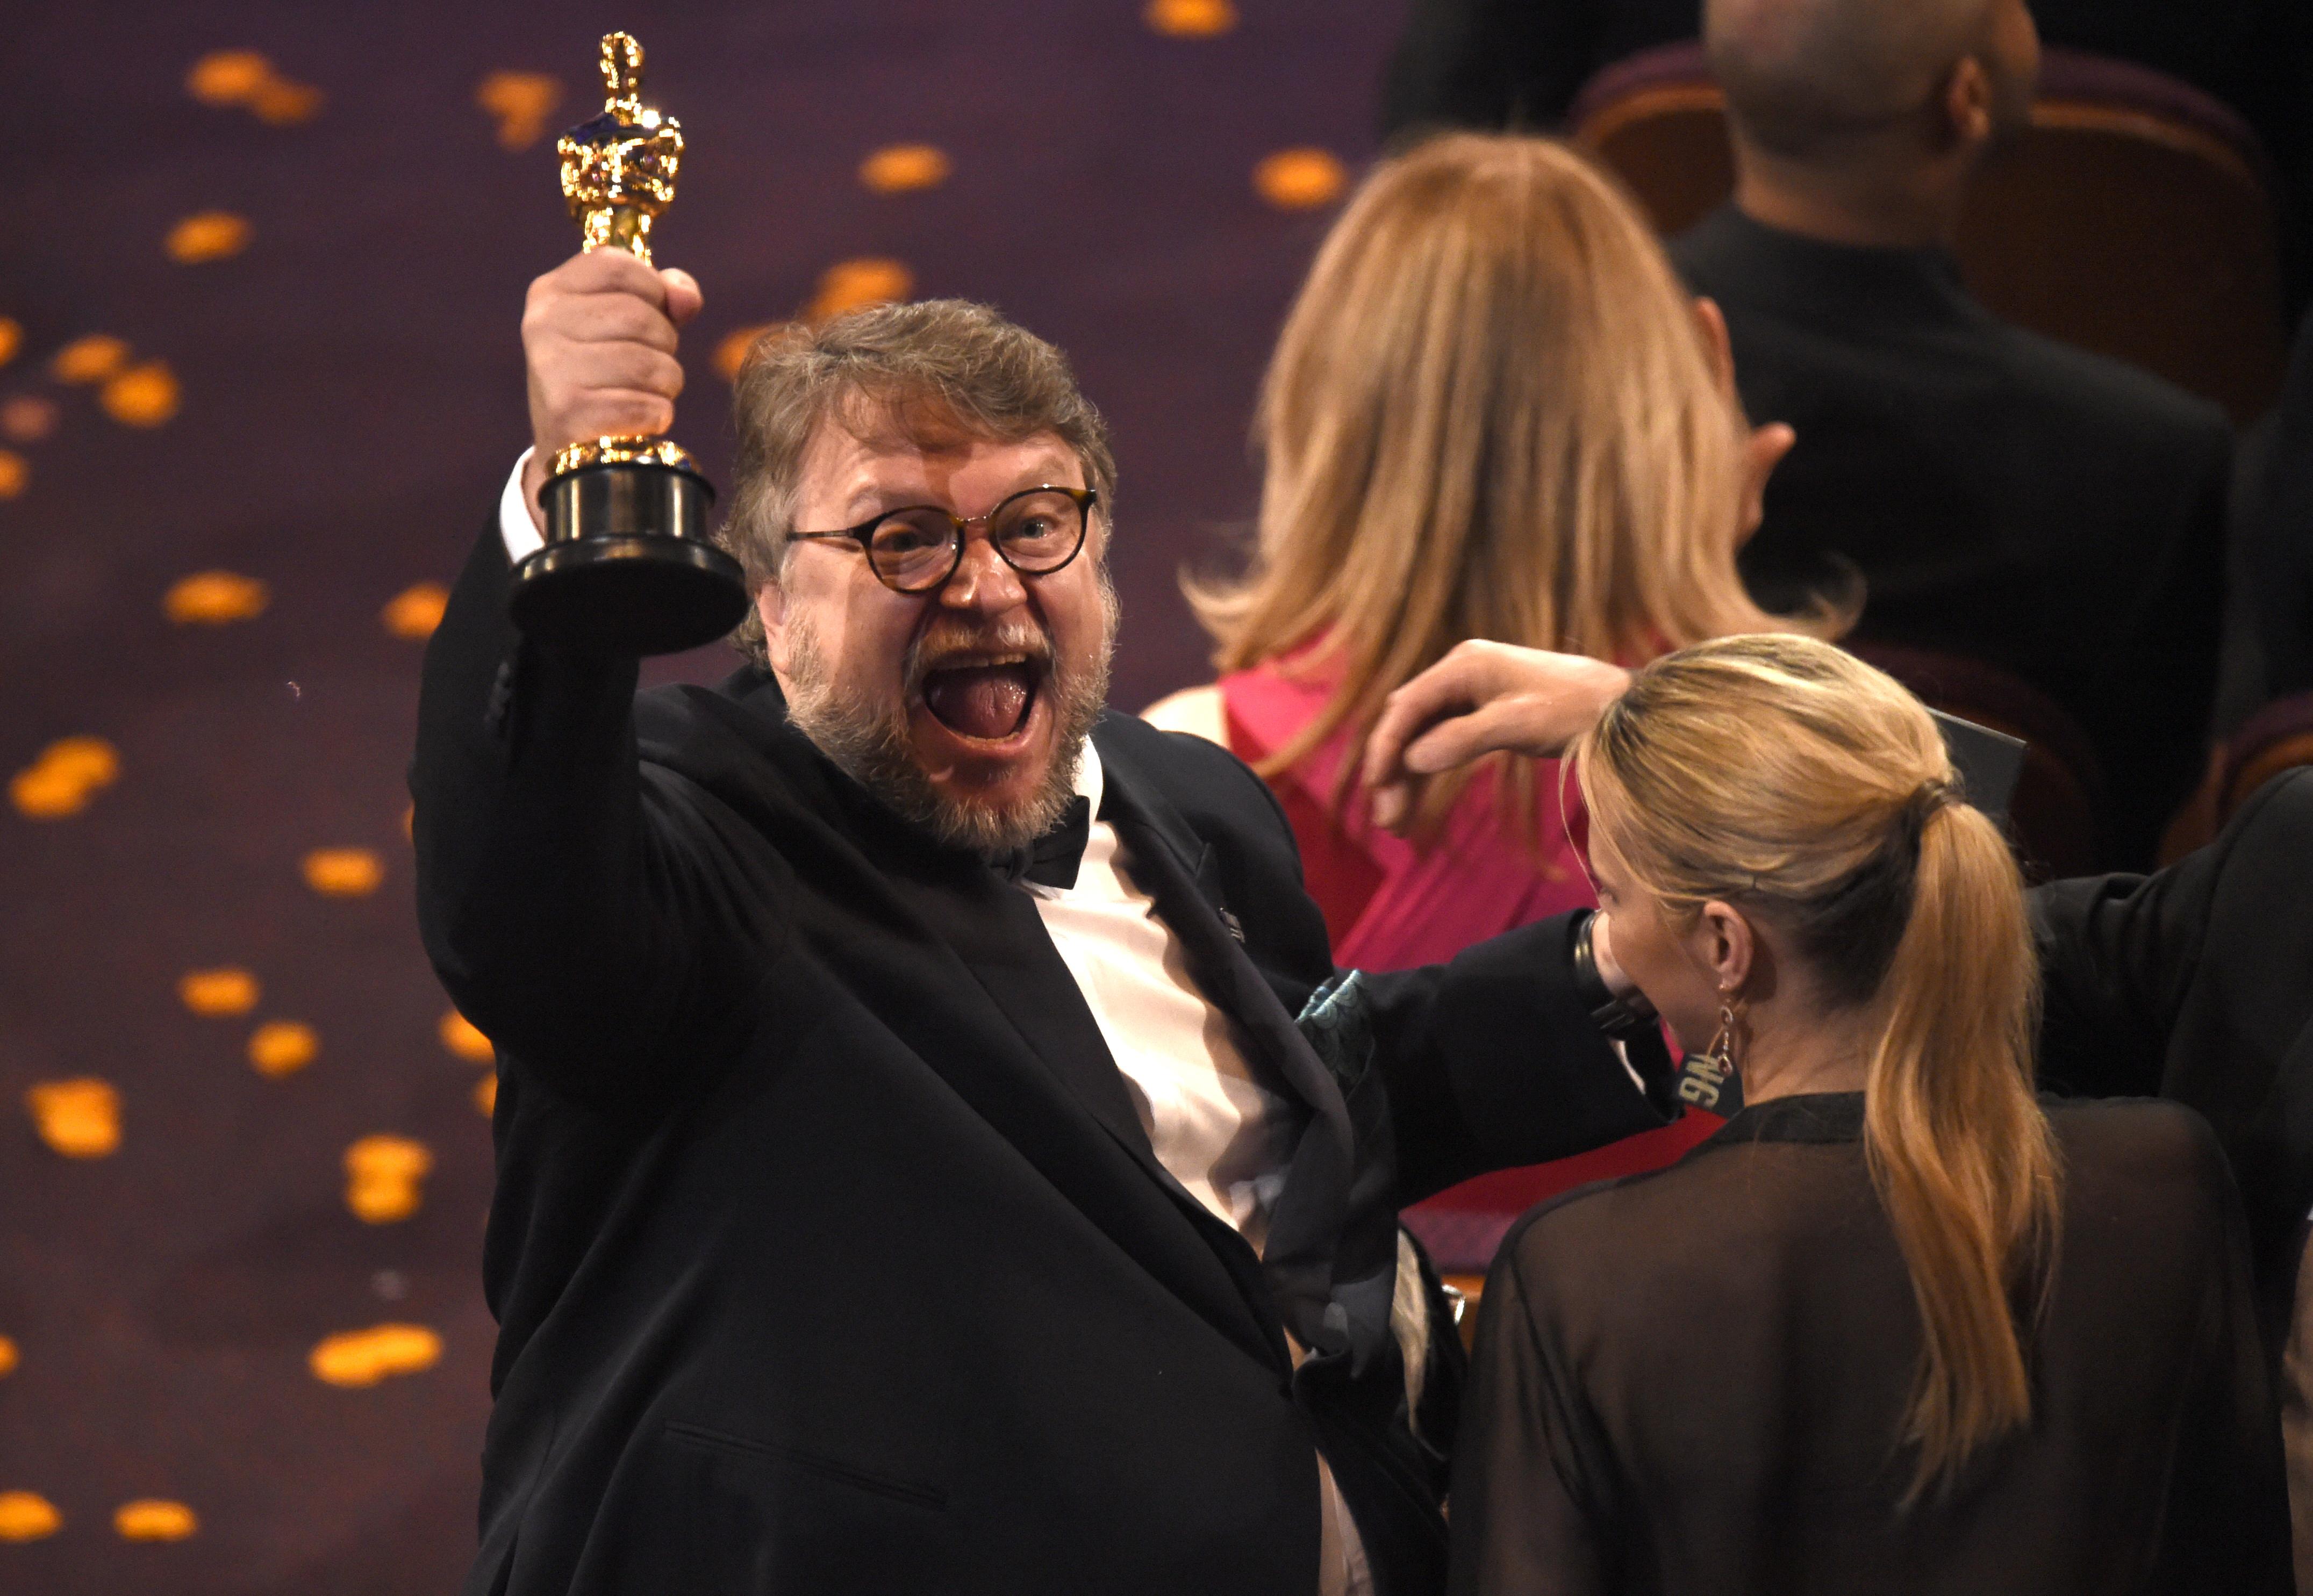 Warren Beatty, Faye Dunaway Get 2nd Chance to Present Oscar